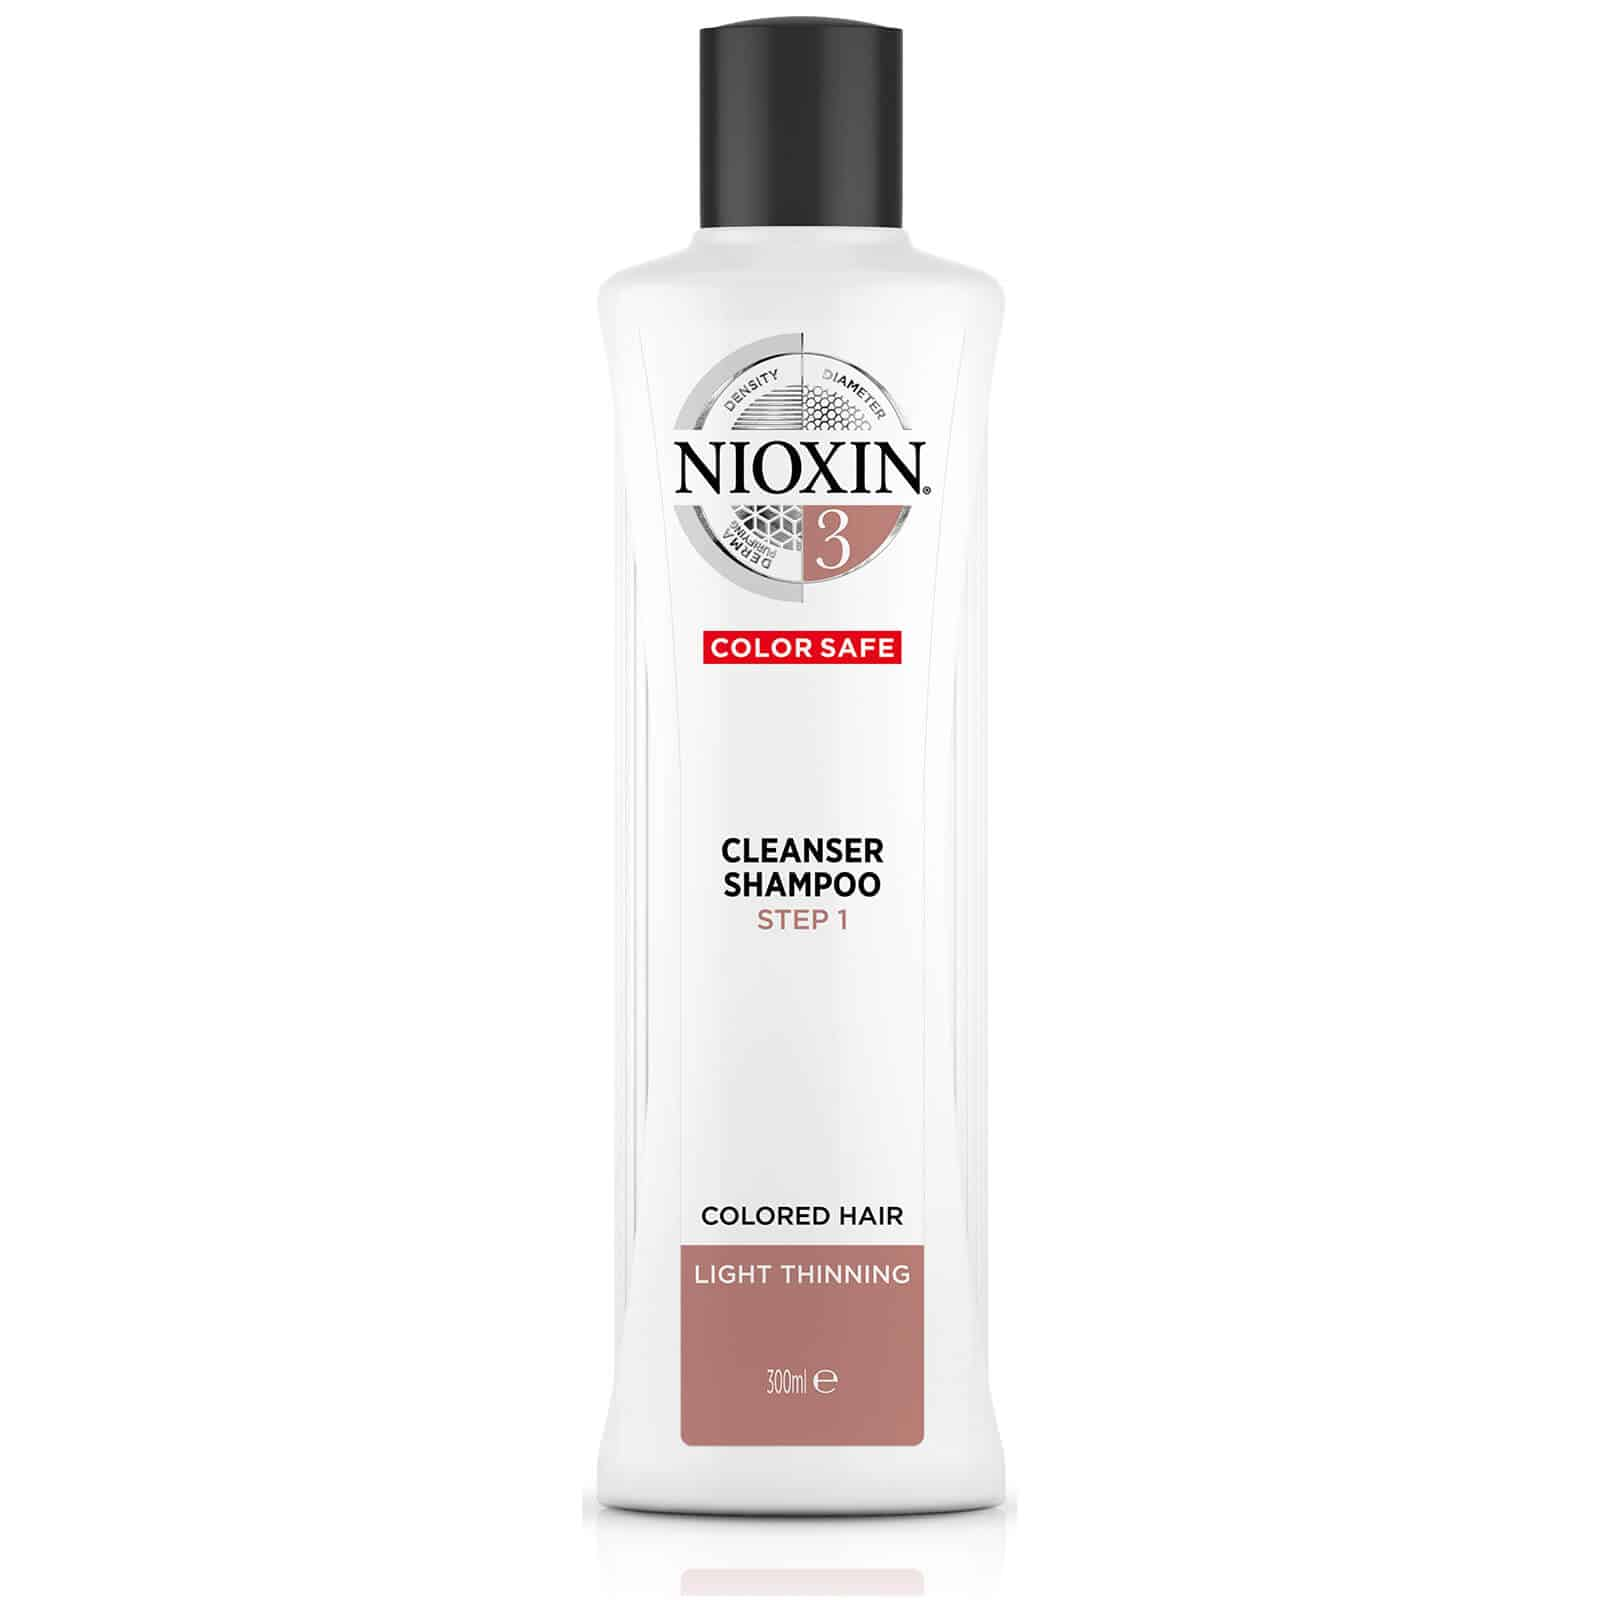 Nioxin System 3 Cleanser Shampoo